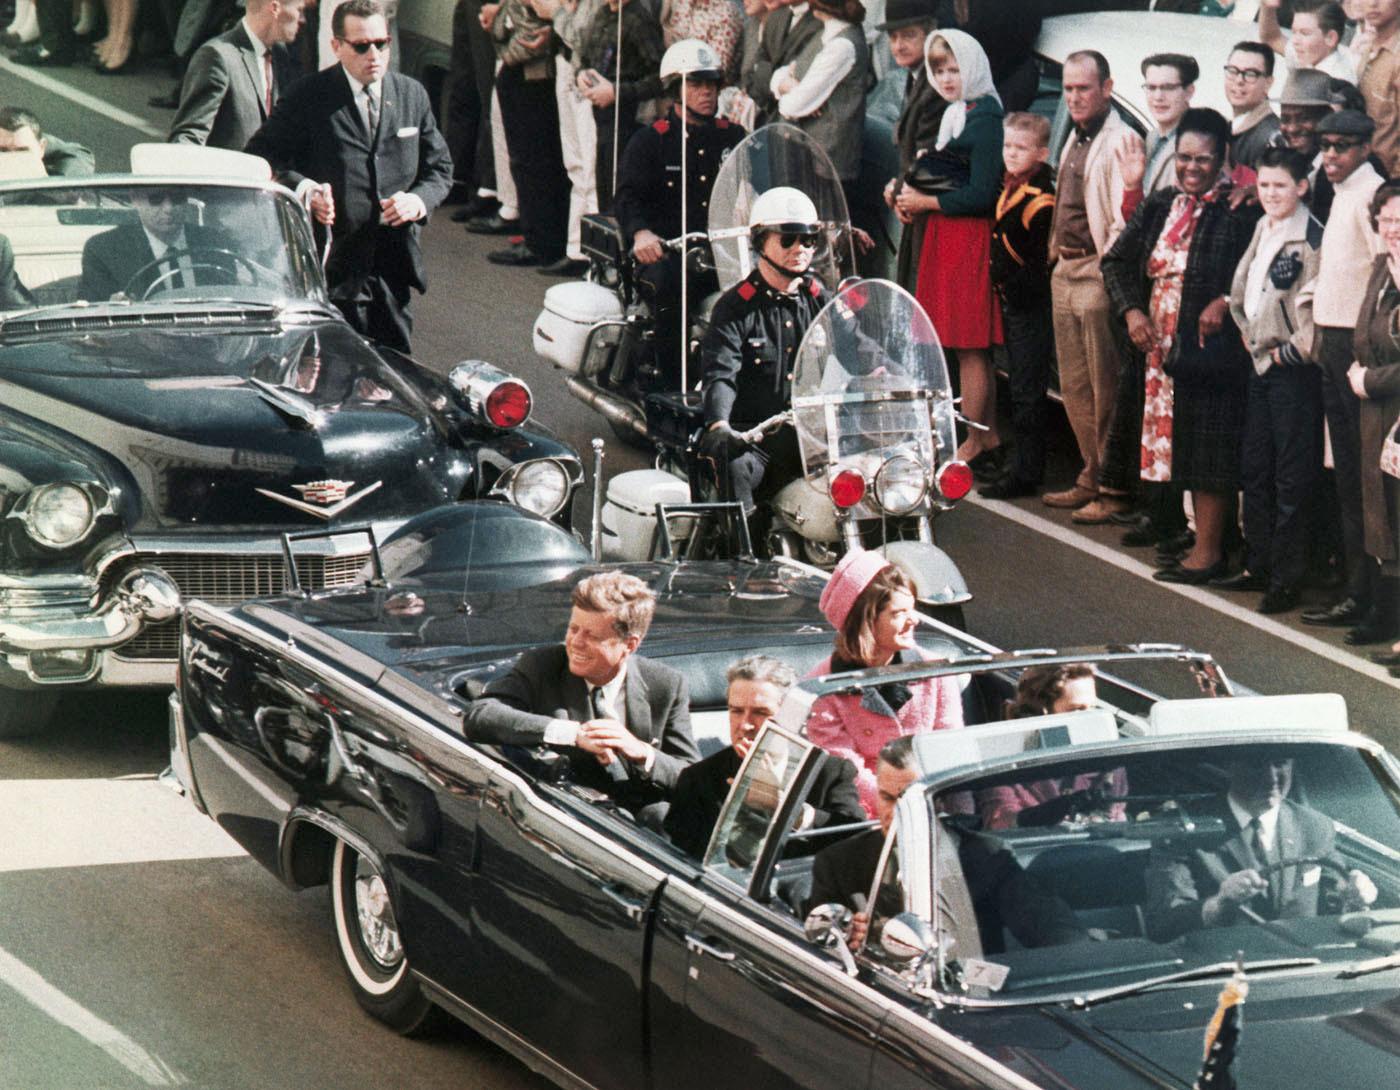 Image: President John F. Kennedy's motorcade in Dallas.